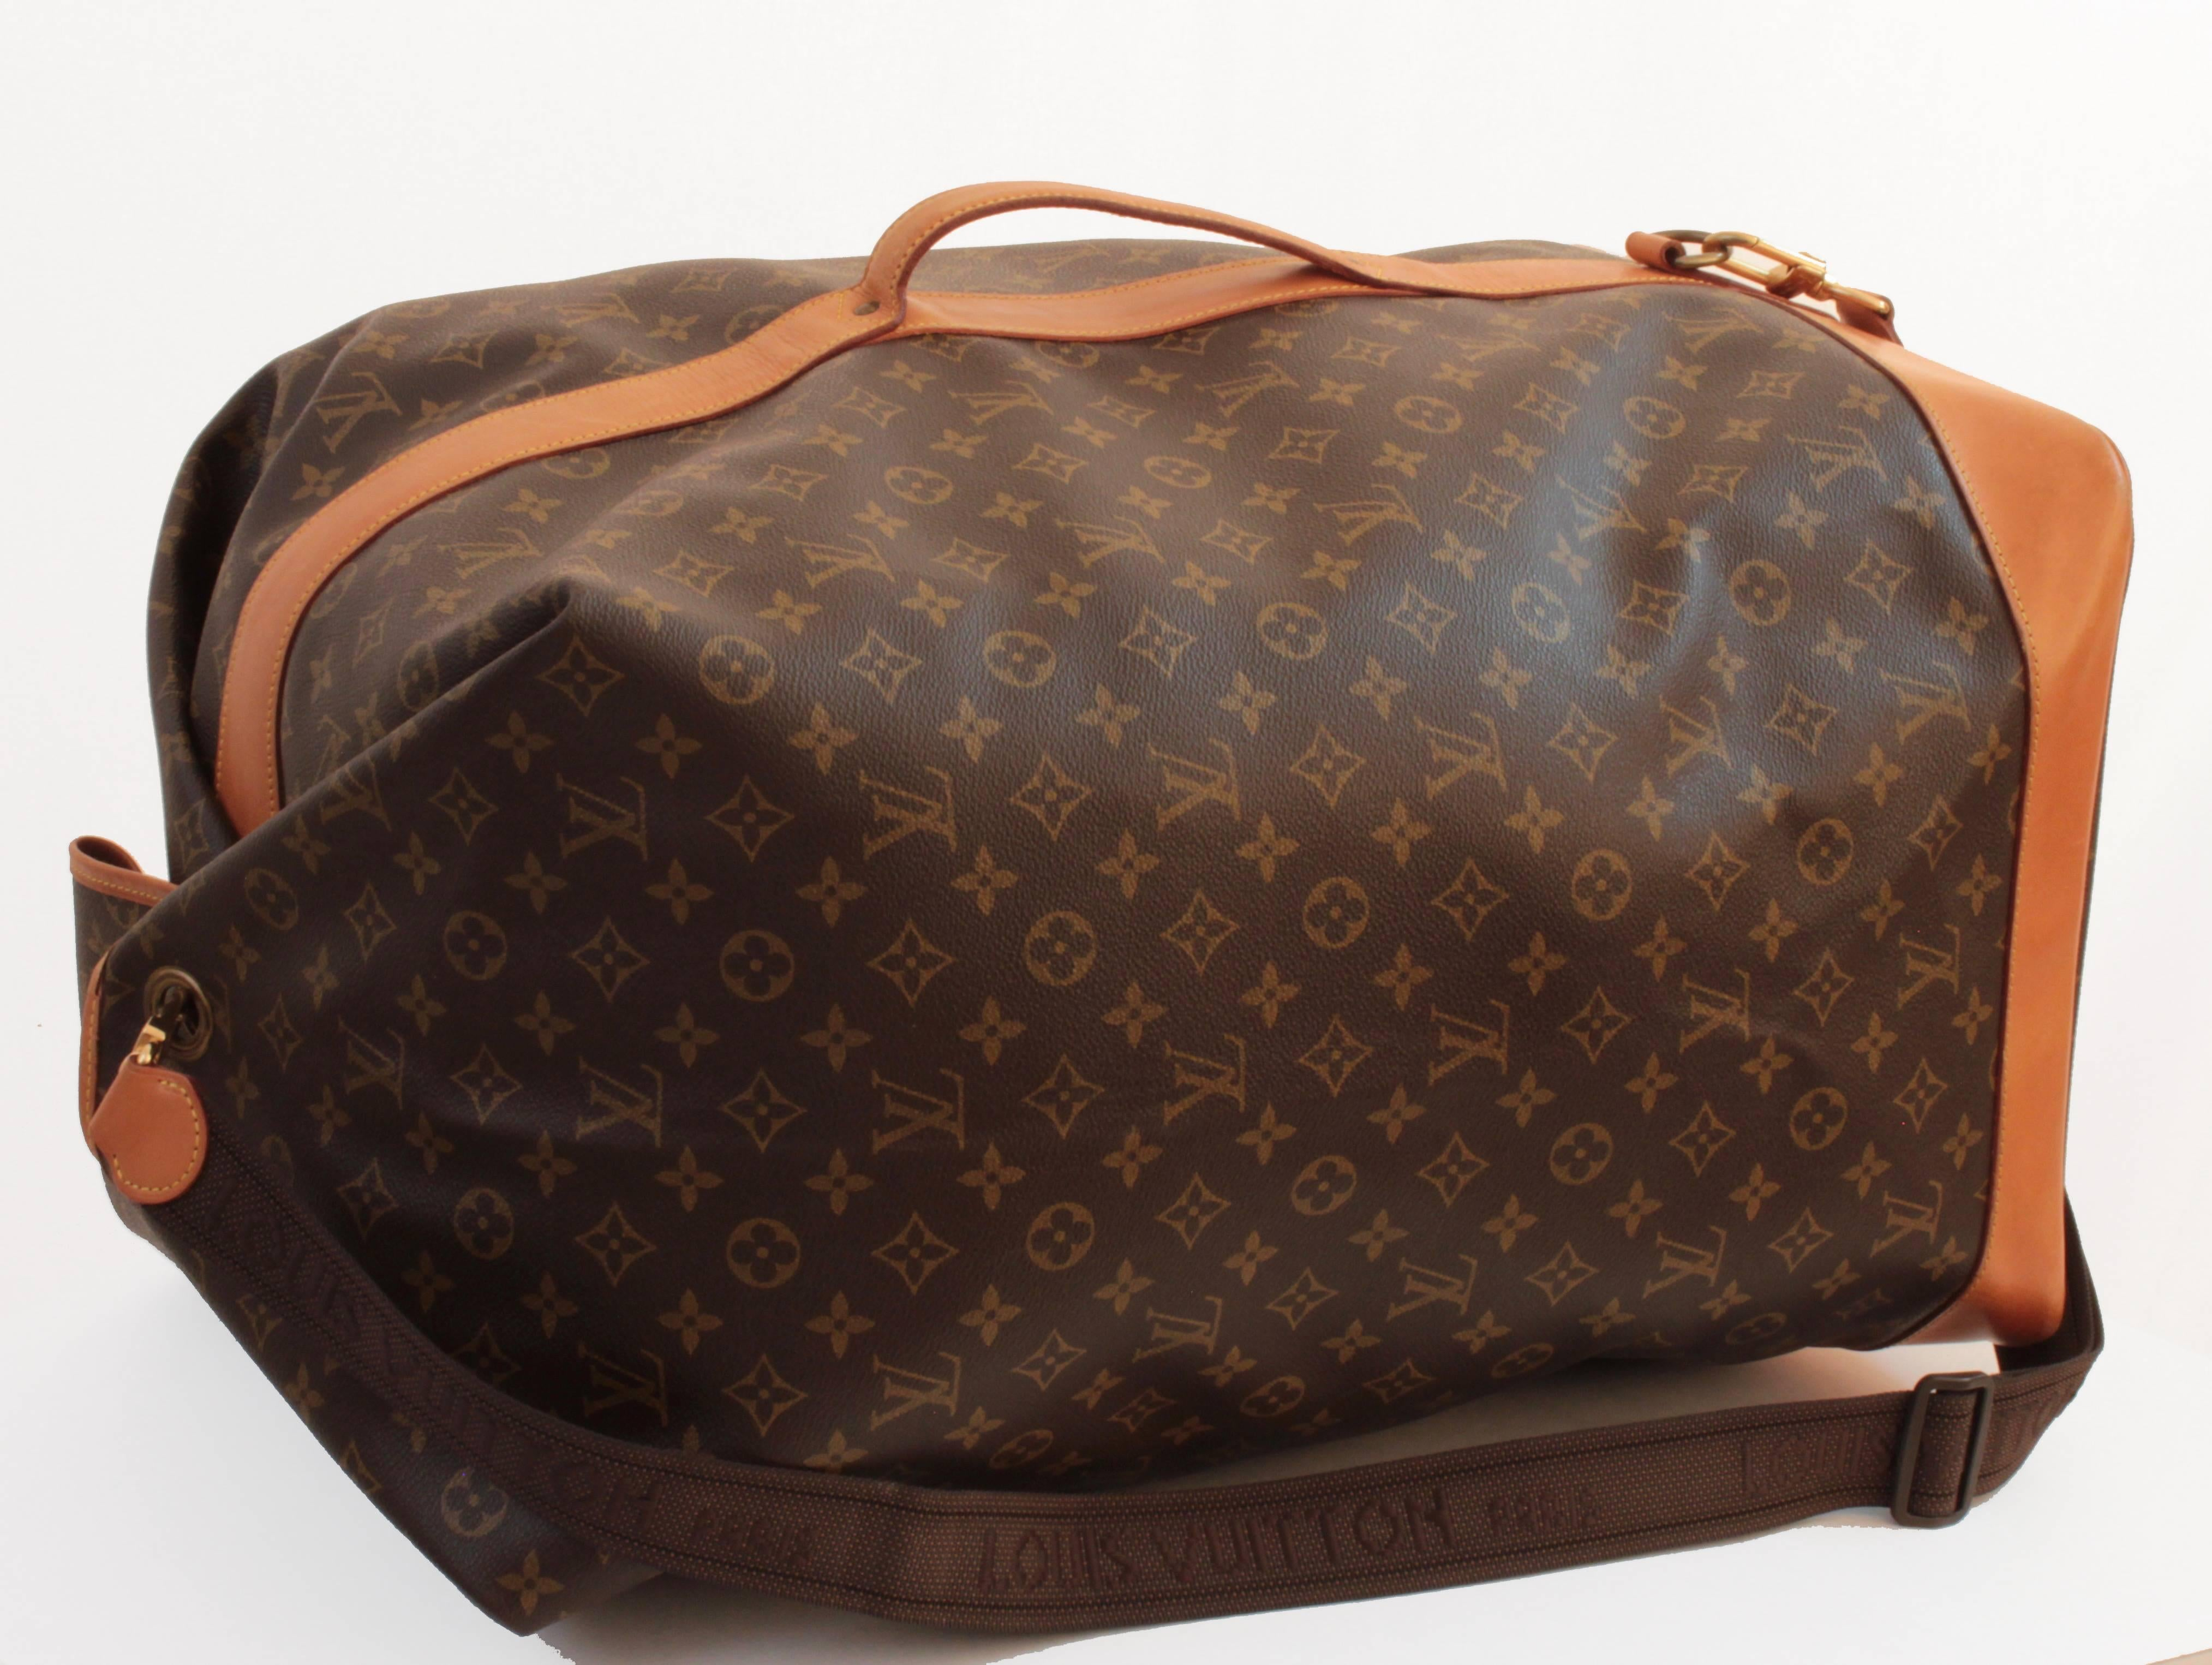 Brown Louis Vuitton Monogram Sac Marin Large Duffle Bag XL Travel Tote  Vintage 90s For Sale